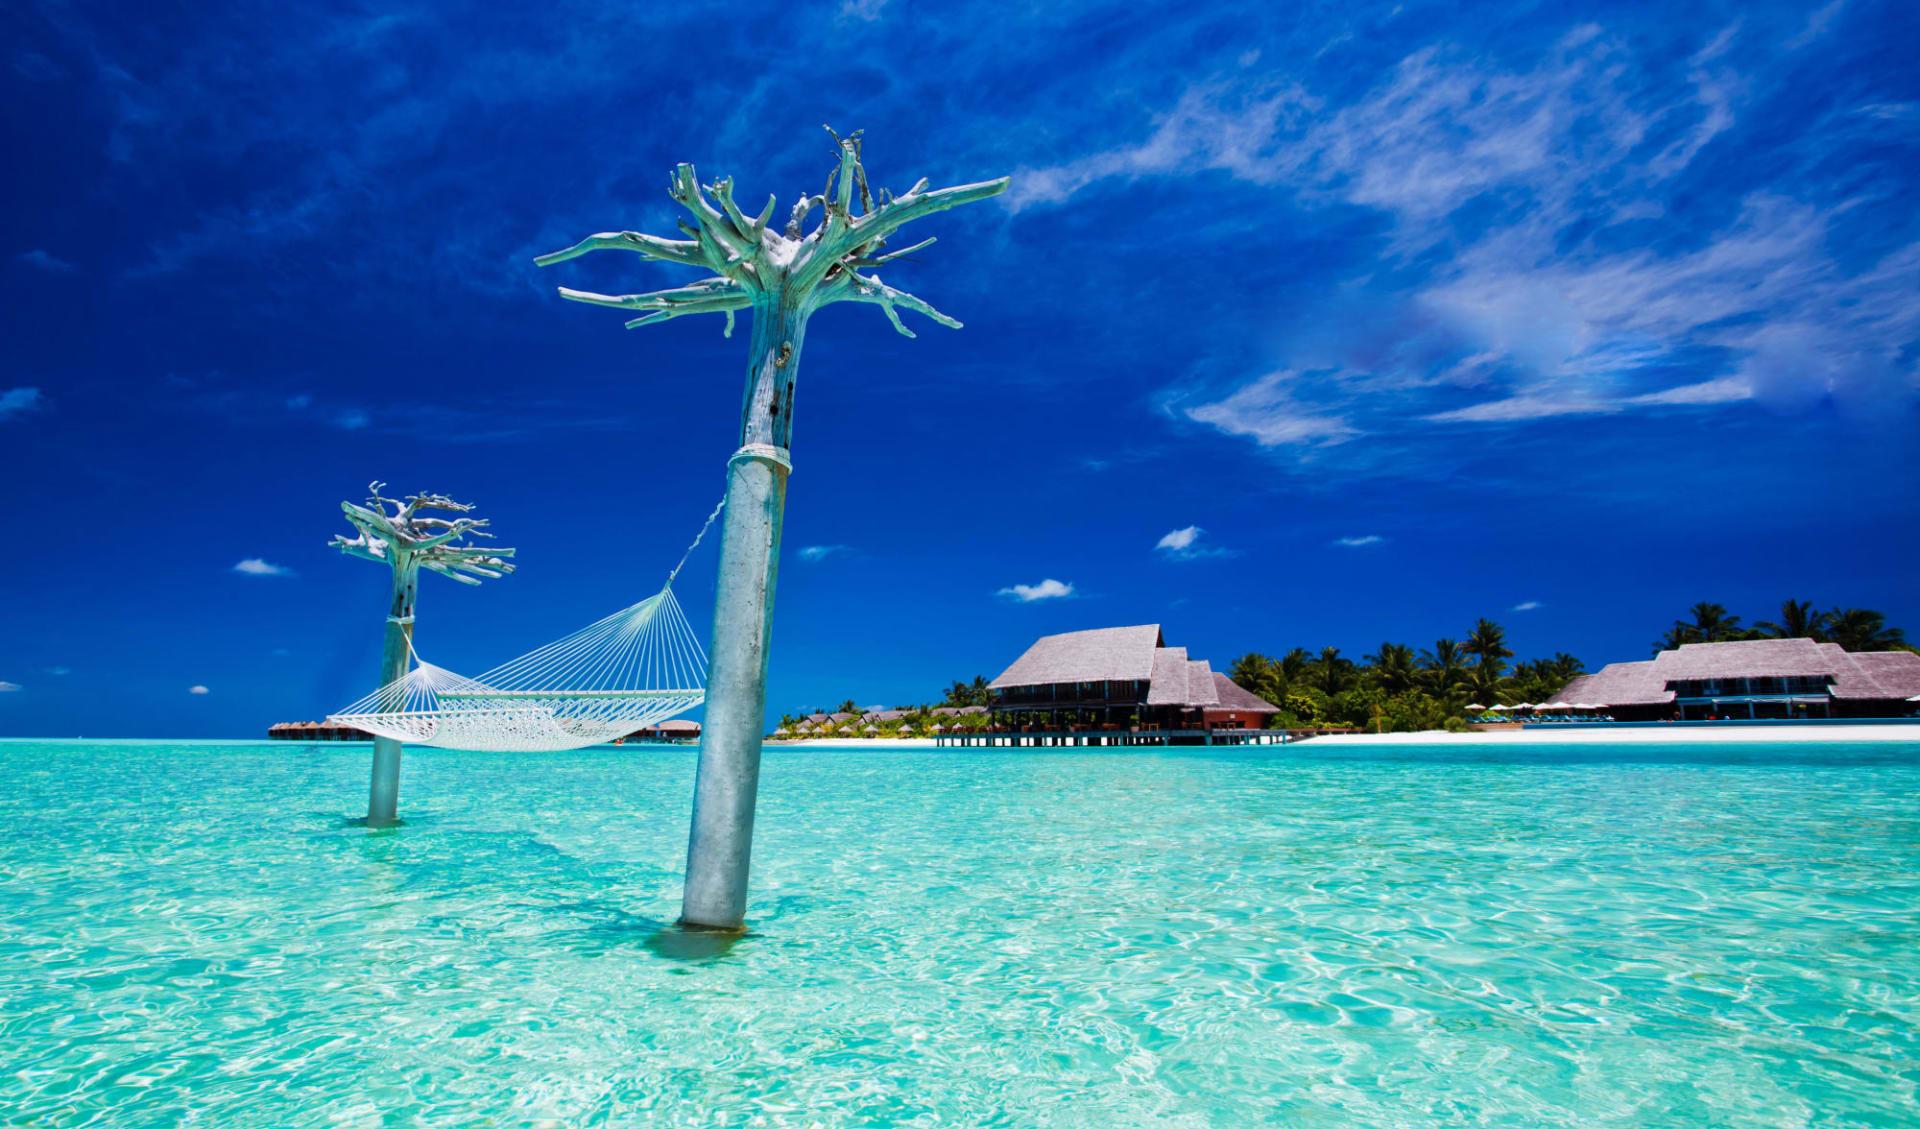 Anantara Dhigu Maldives Resort in Südmale-Atoll: